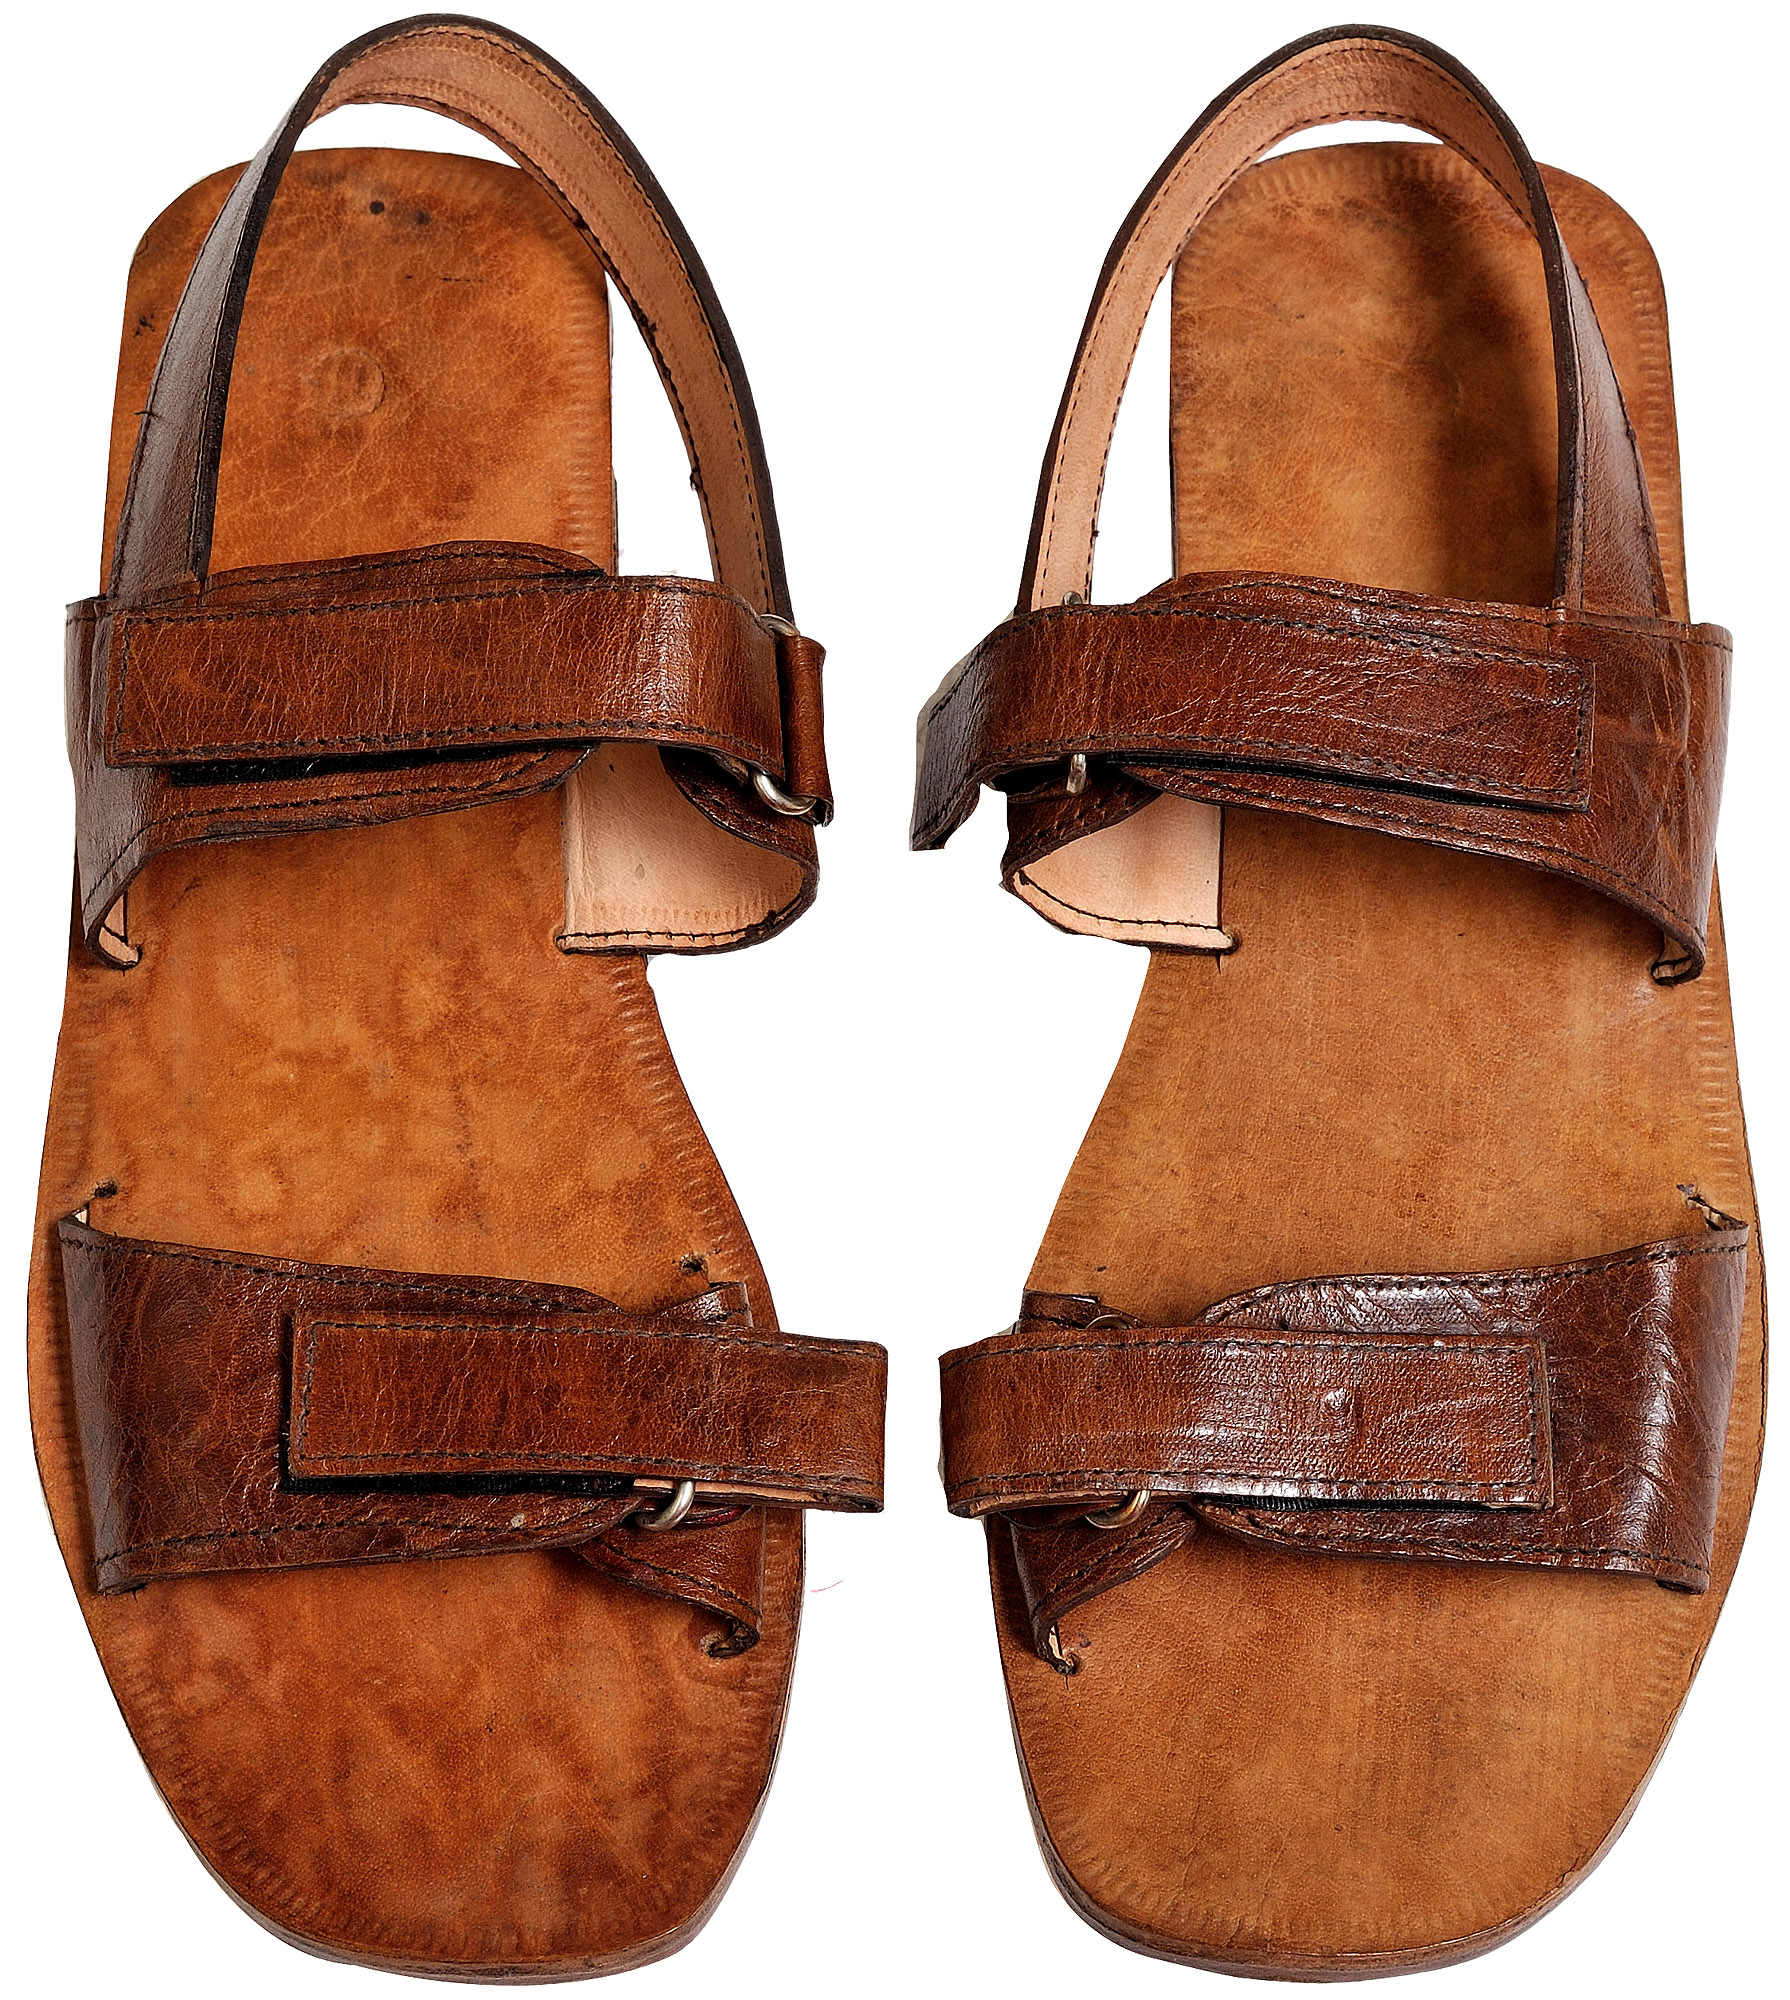 9e012358565141 Triple-Strapped Brown Sandals for Men from Jodhpur